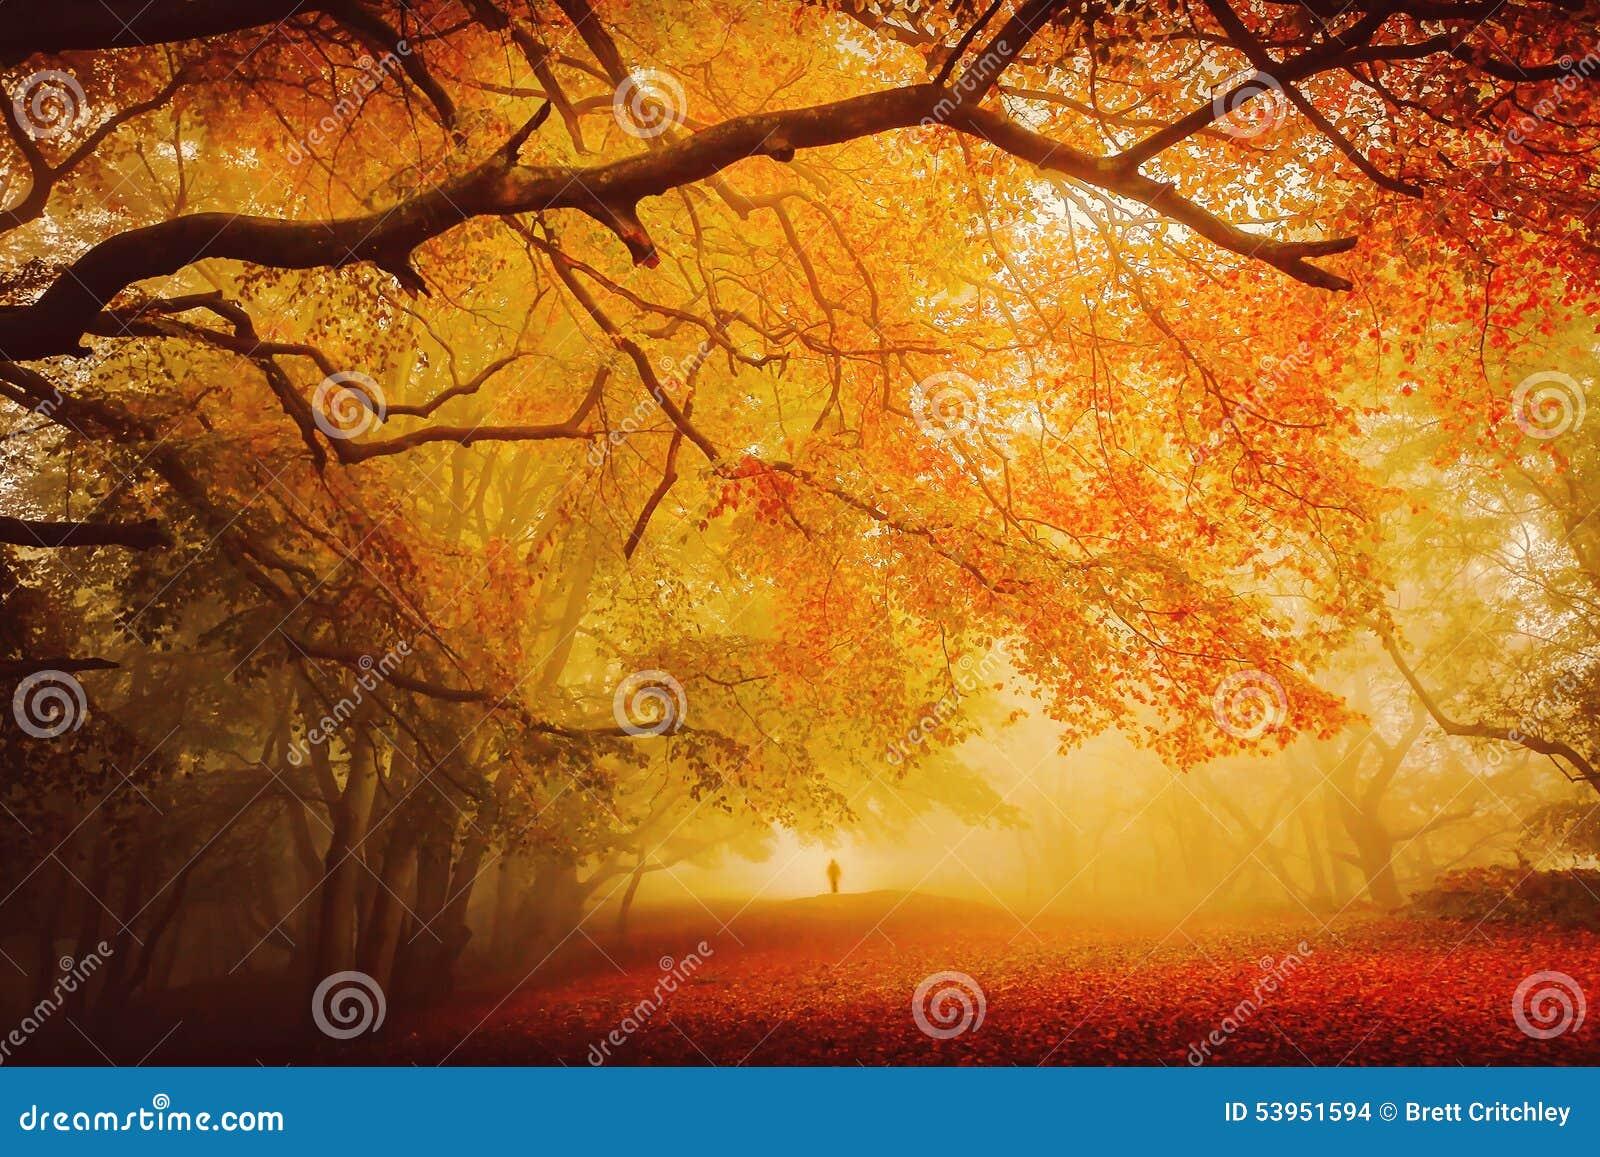 Seasonal forest fall walk